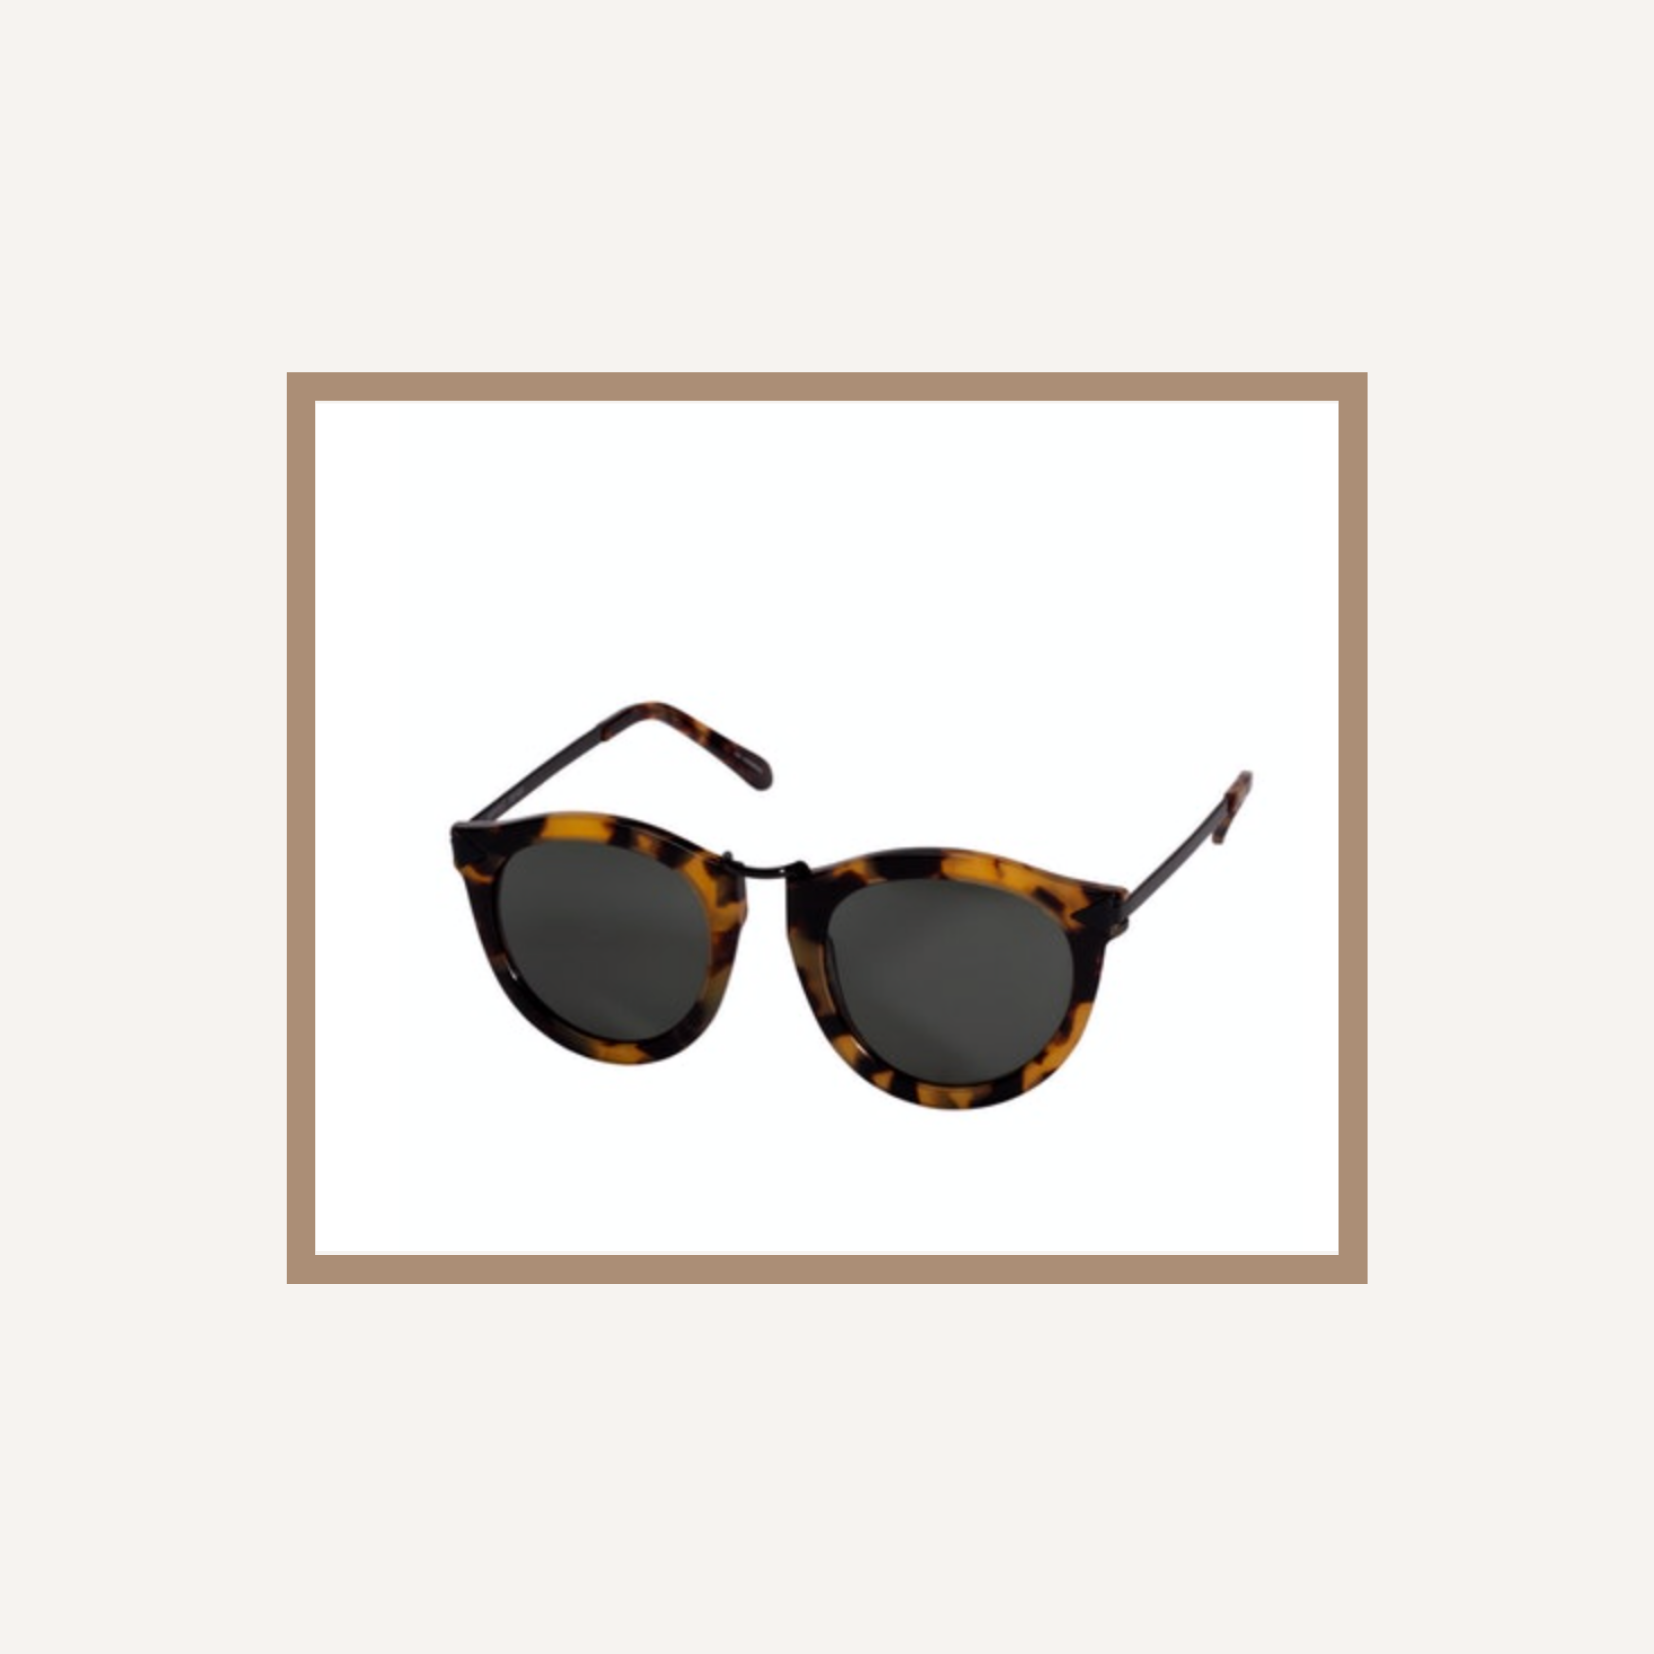 Favorite Sunglasses for All Seasons | Karen Walker Sunglasses | Louella Reese